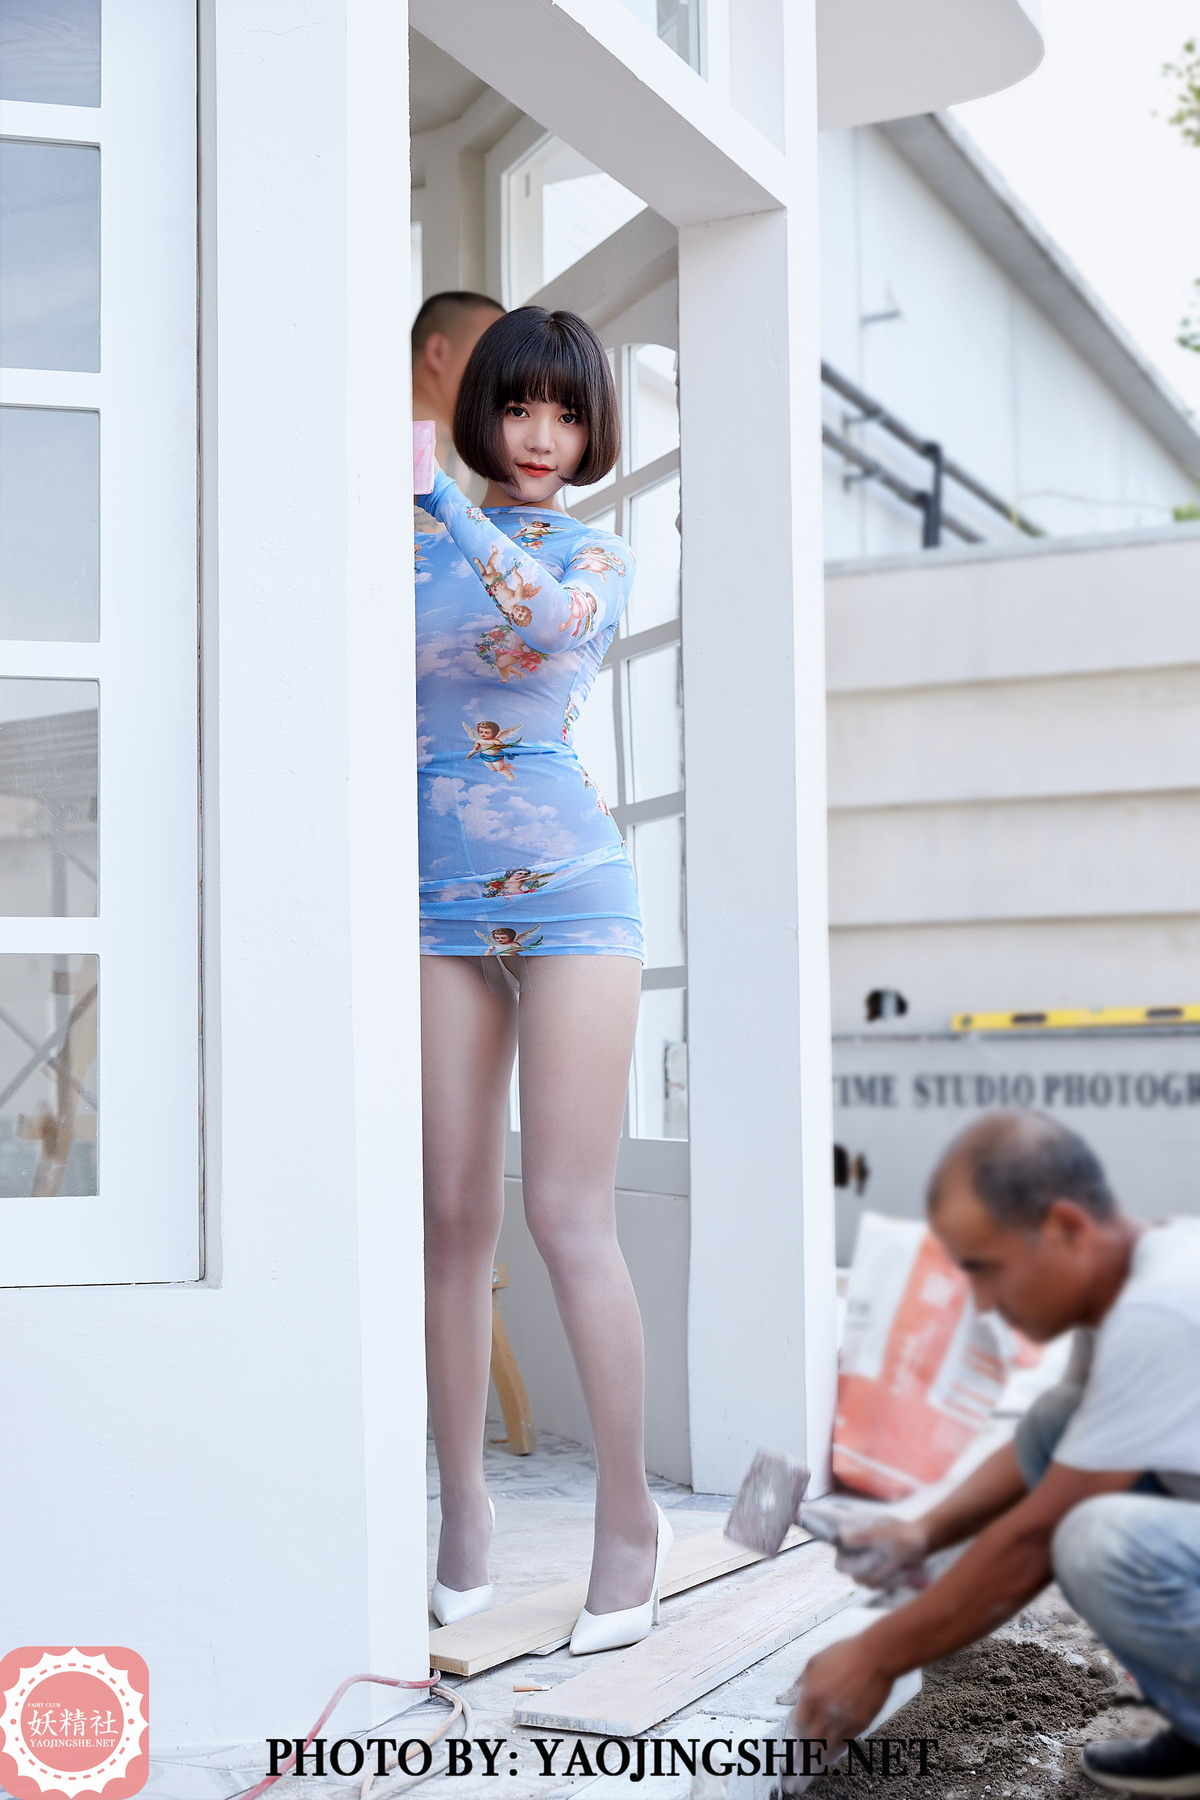 [FAIRY CLUB妖精社]2020.10.22 T2035《装修工》唐飞飞[/397MB]